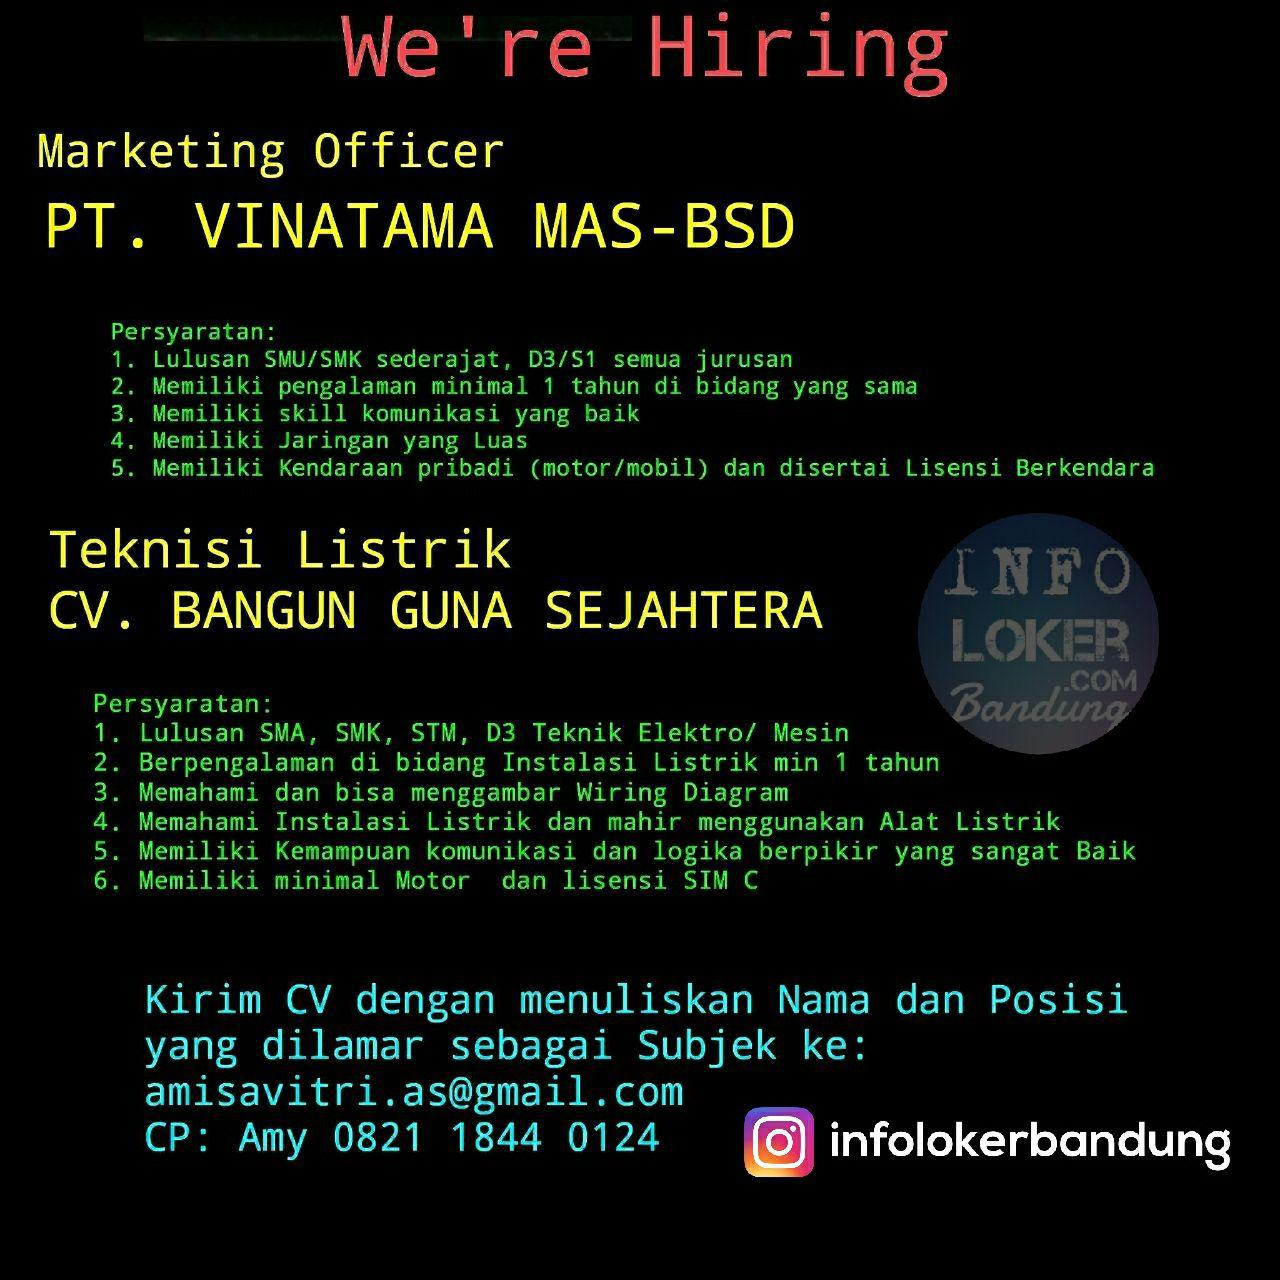 Lowongan Kerja PT. Vinatama Mas-BSD & CV. Bangun Guna Sejahtera Bandung Januari 2018